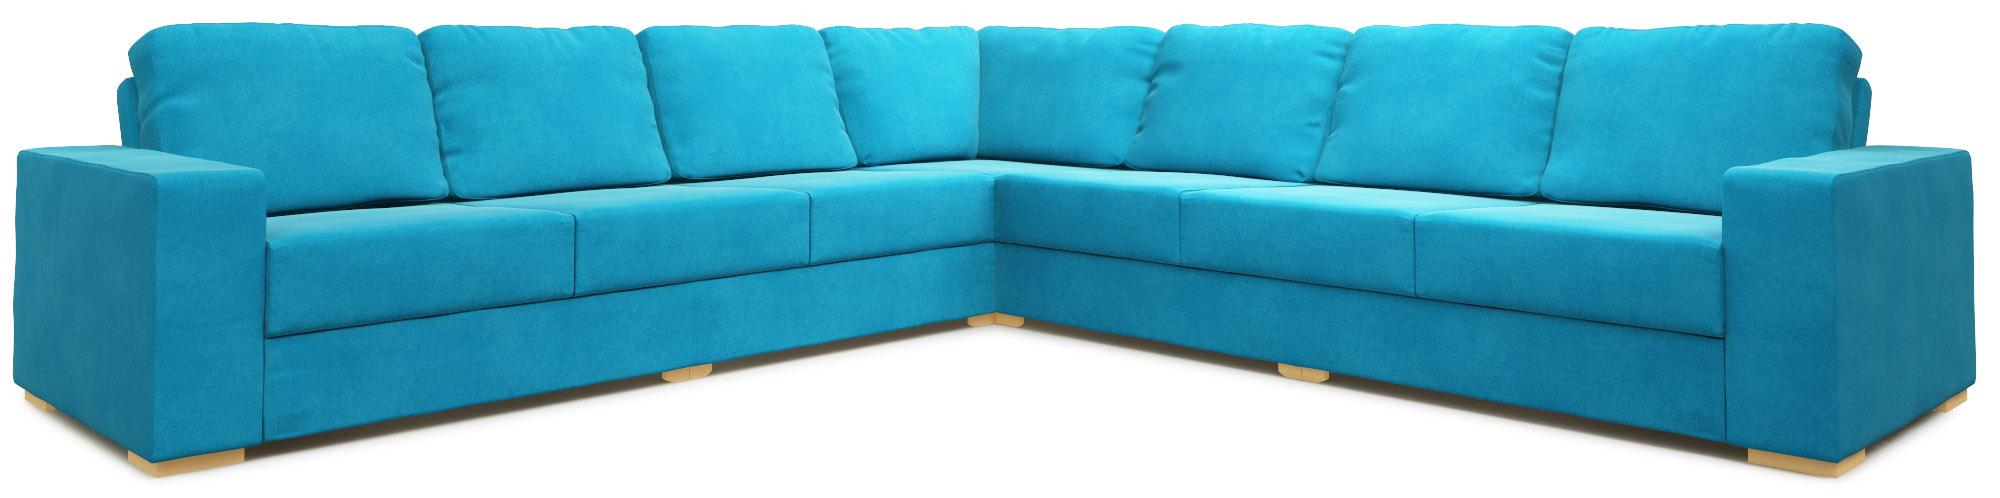 Sker 4X4 Corner Sofa